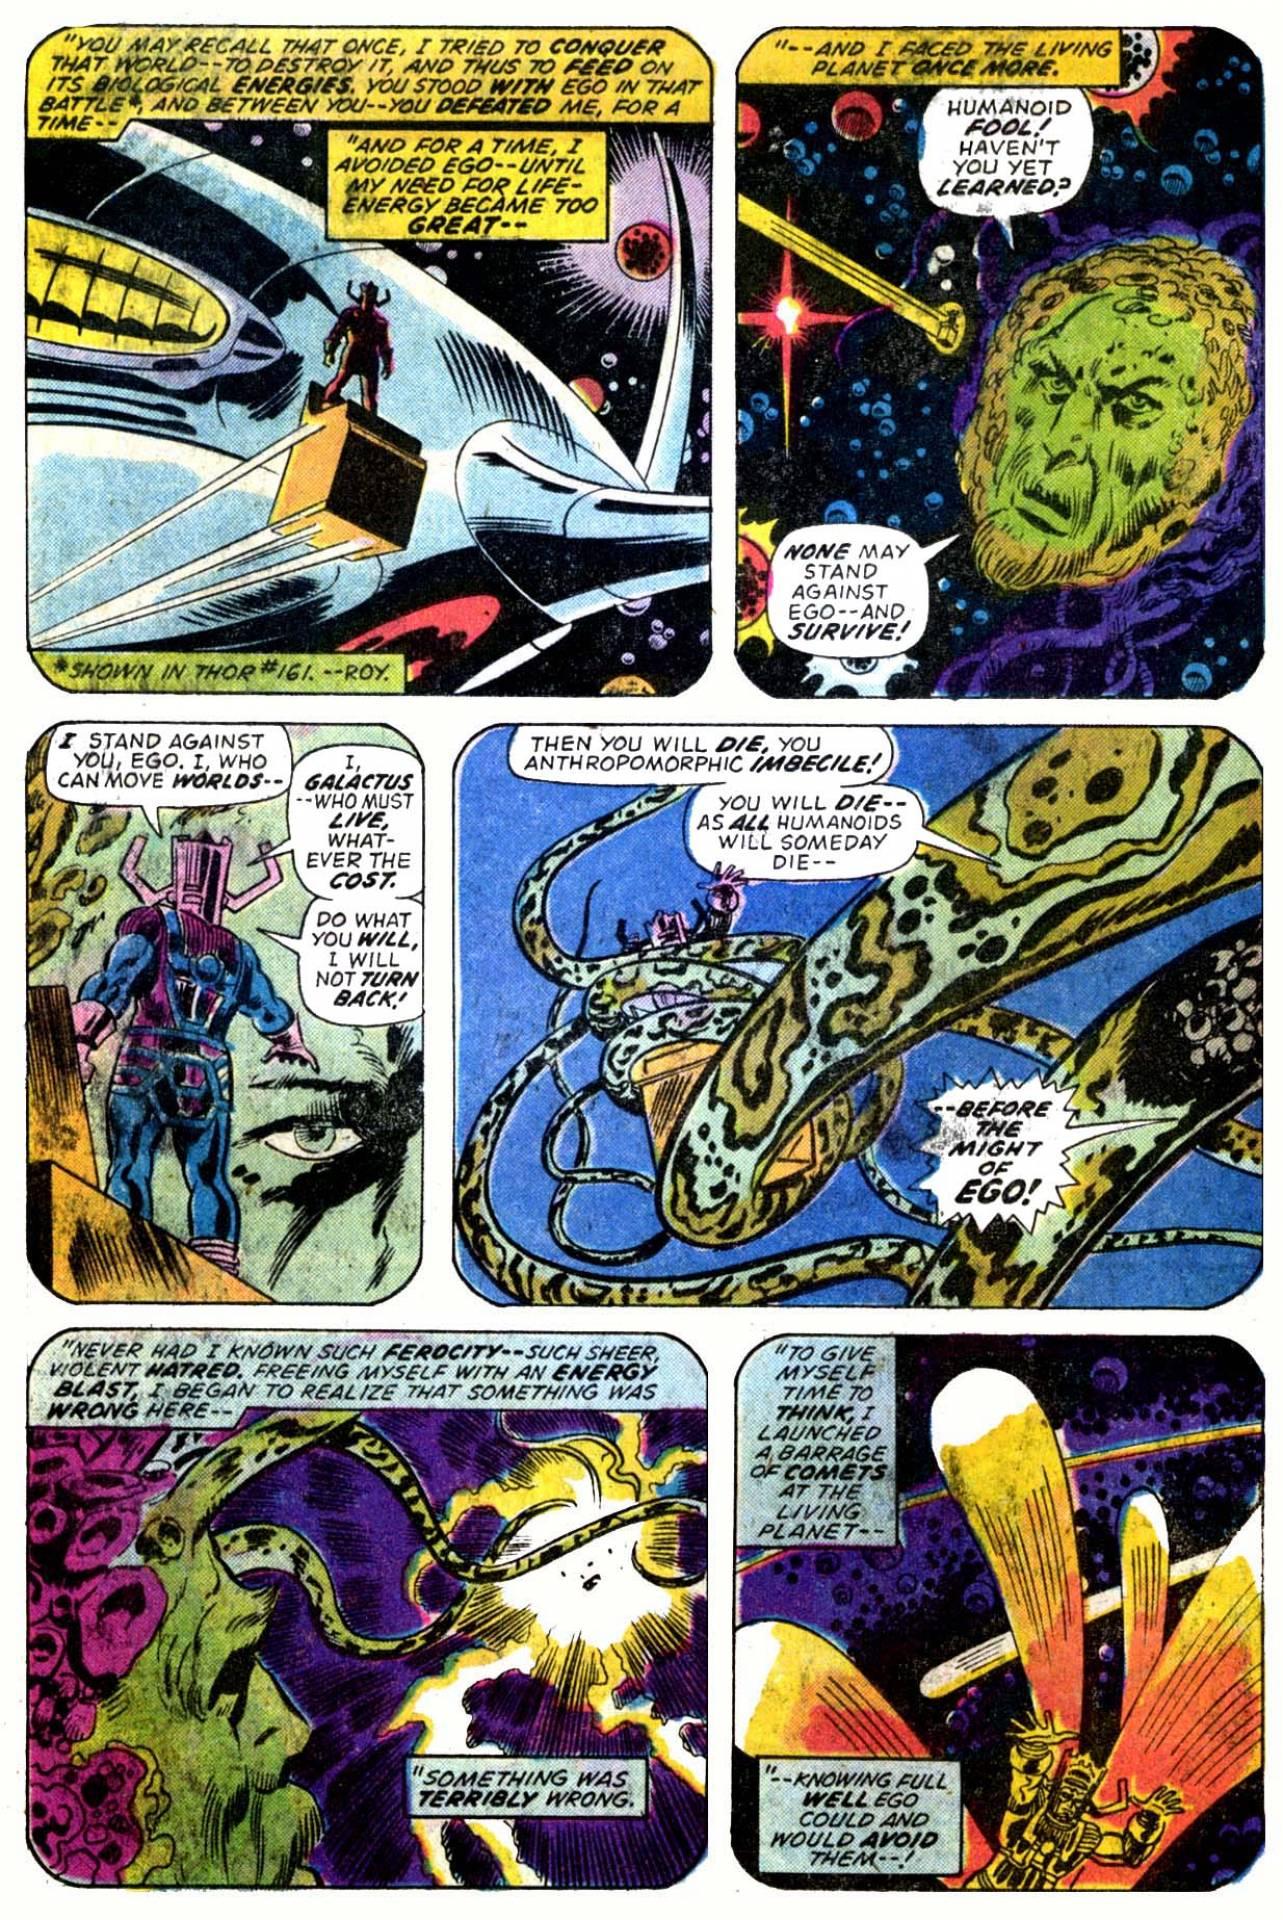 Galactus vs. Ego